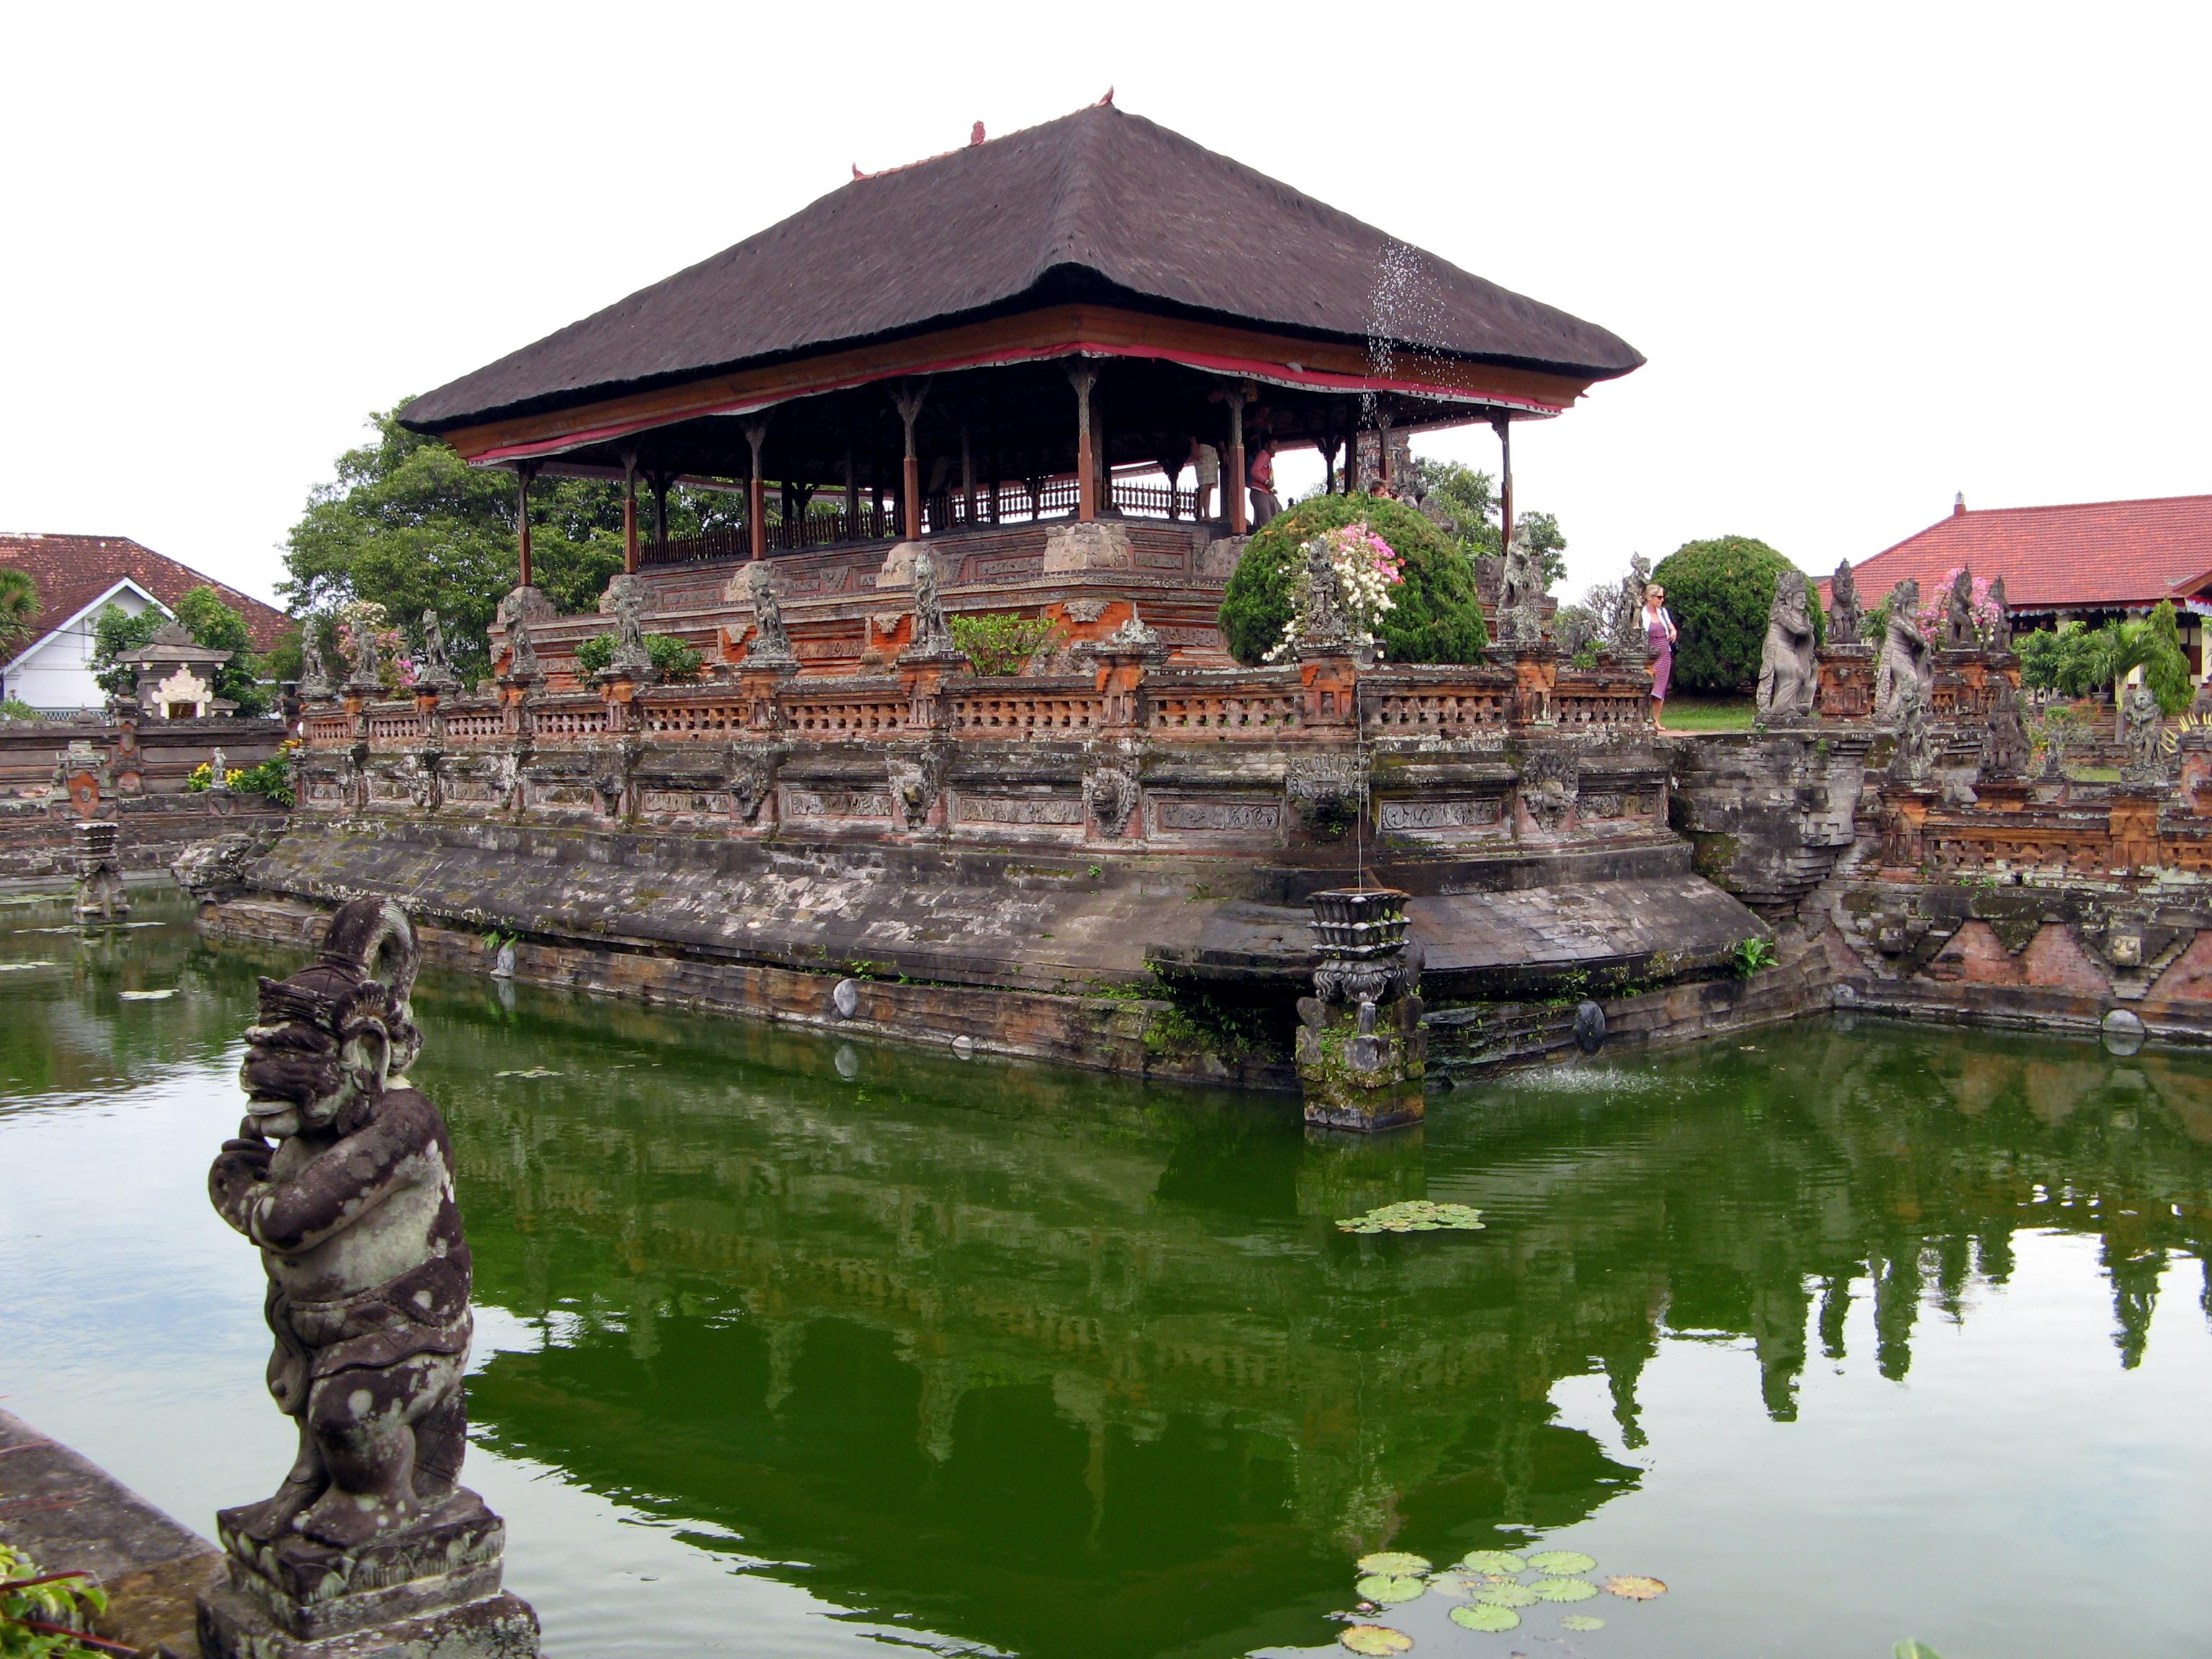 File:Bale Kambang in Taman Gili, Bali 1531.jpg - Wikimedia ...